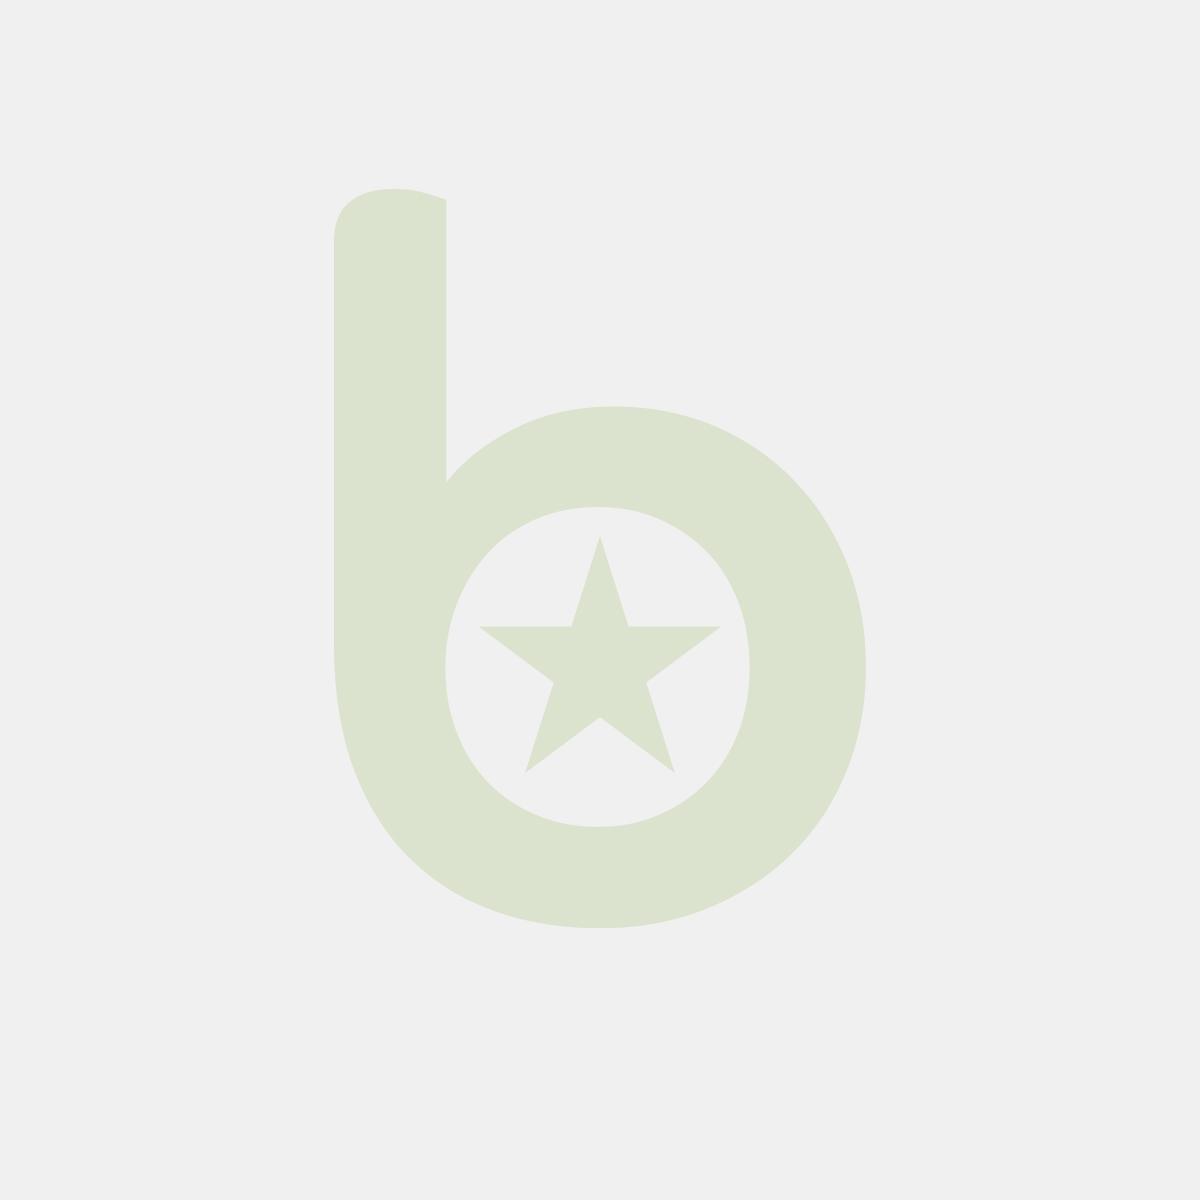 Podkłady PAPSTAR Royal Collection 30cm/40cm 100szt bordowyTissue